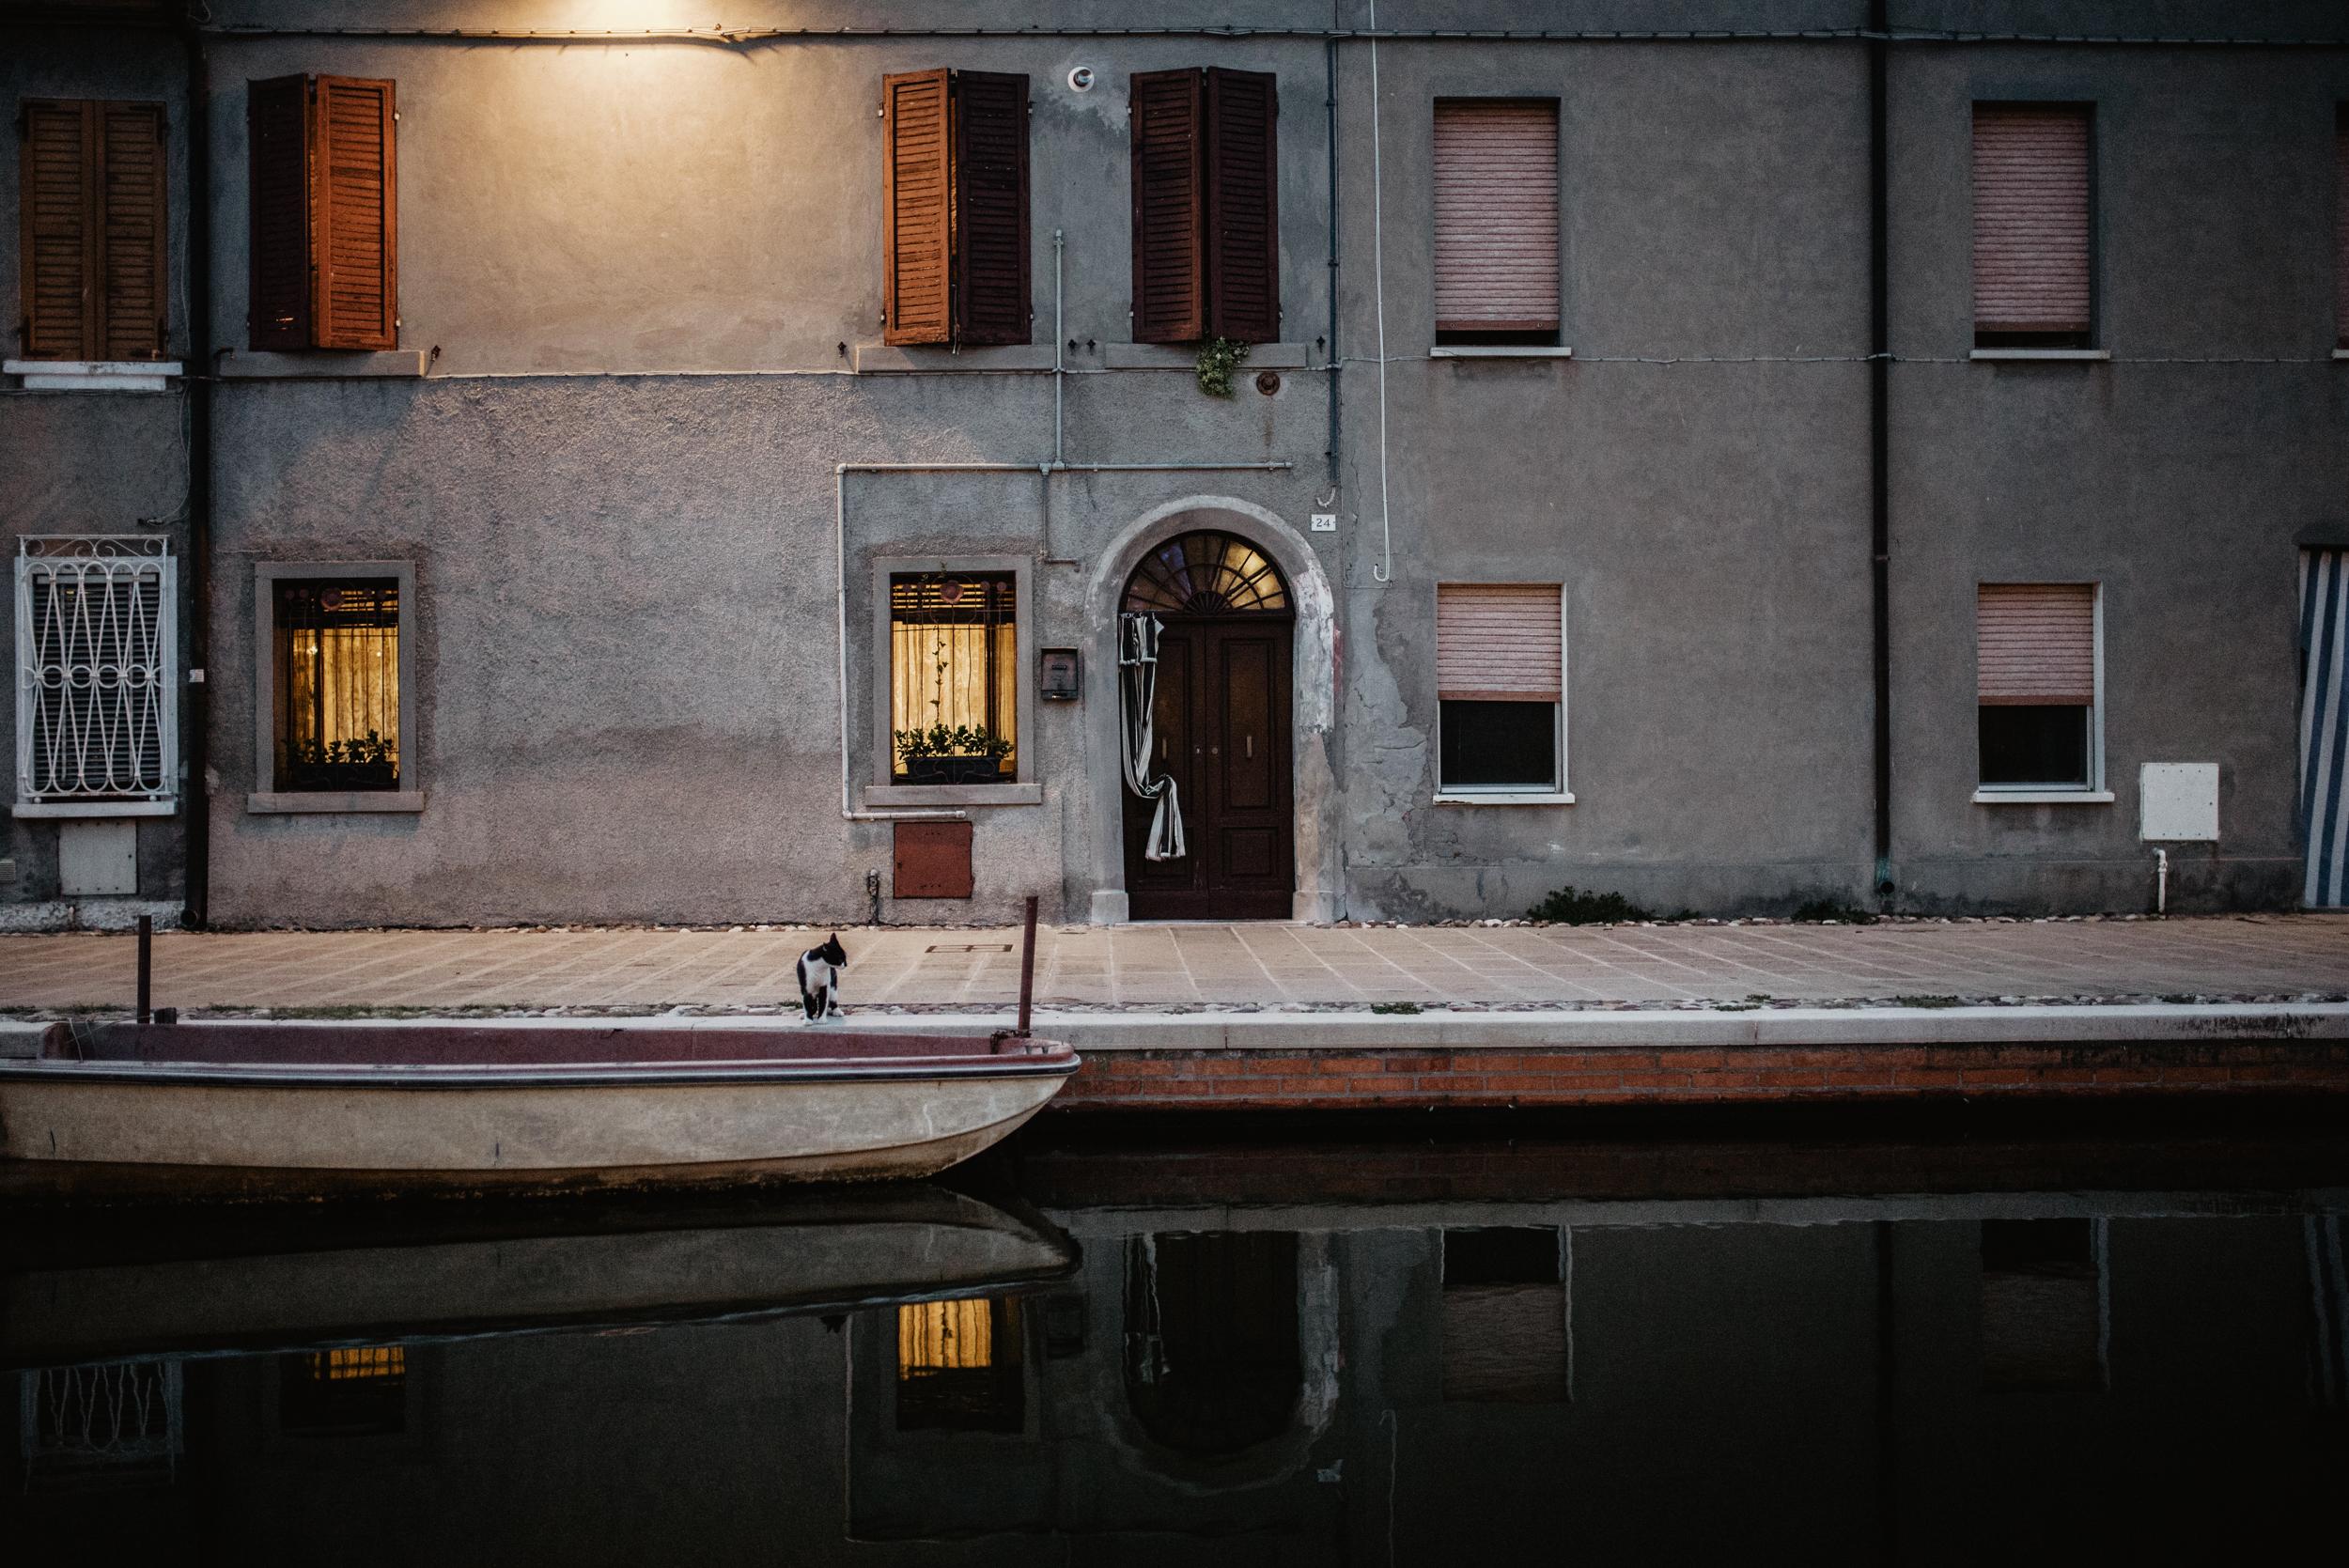 Italien Geheimtipp Comacchio_Reise_Erfahrung_Tipp_Lage_Restaurant_final1